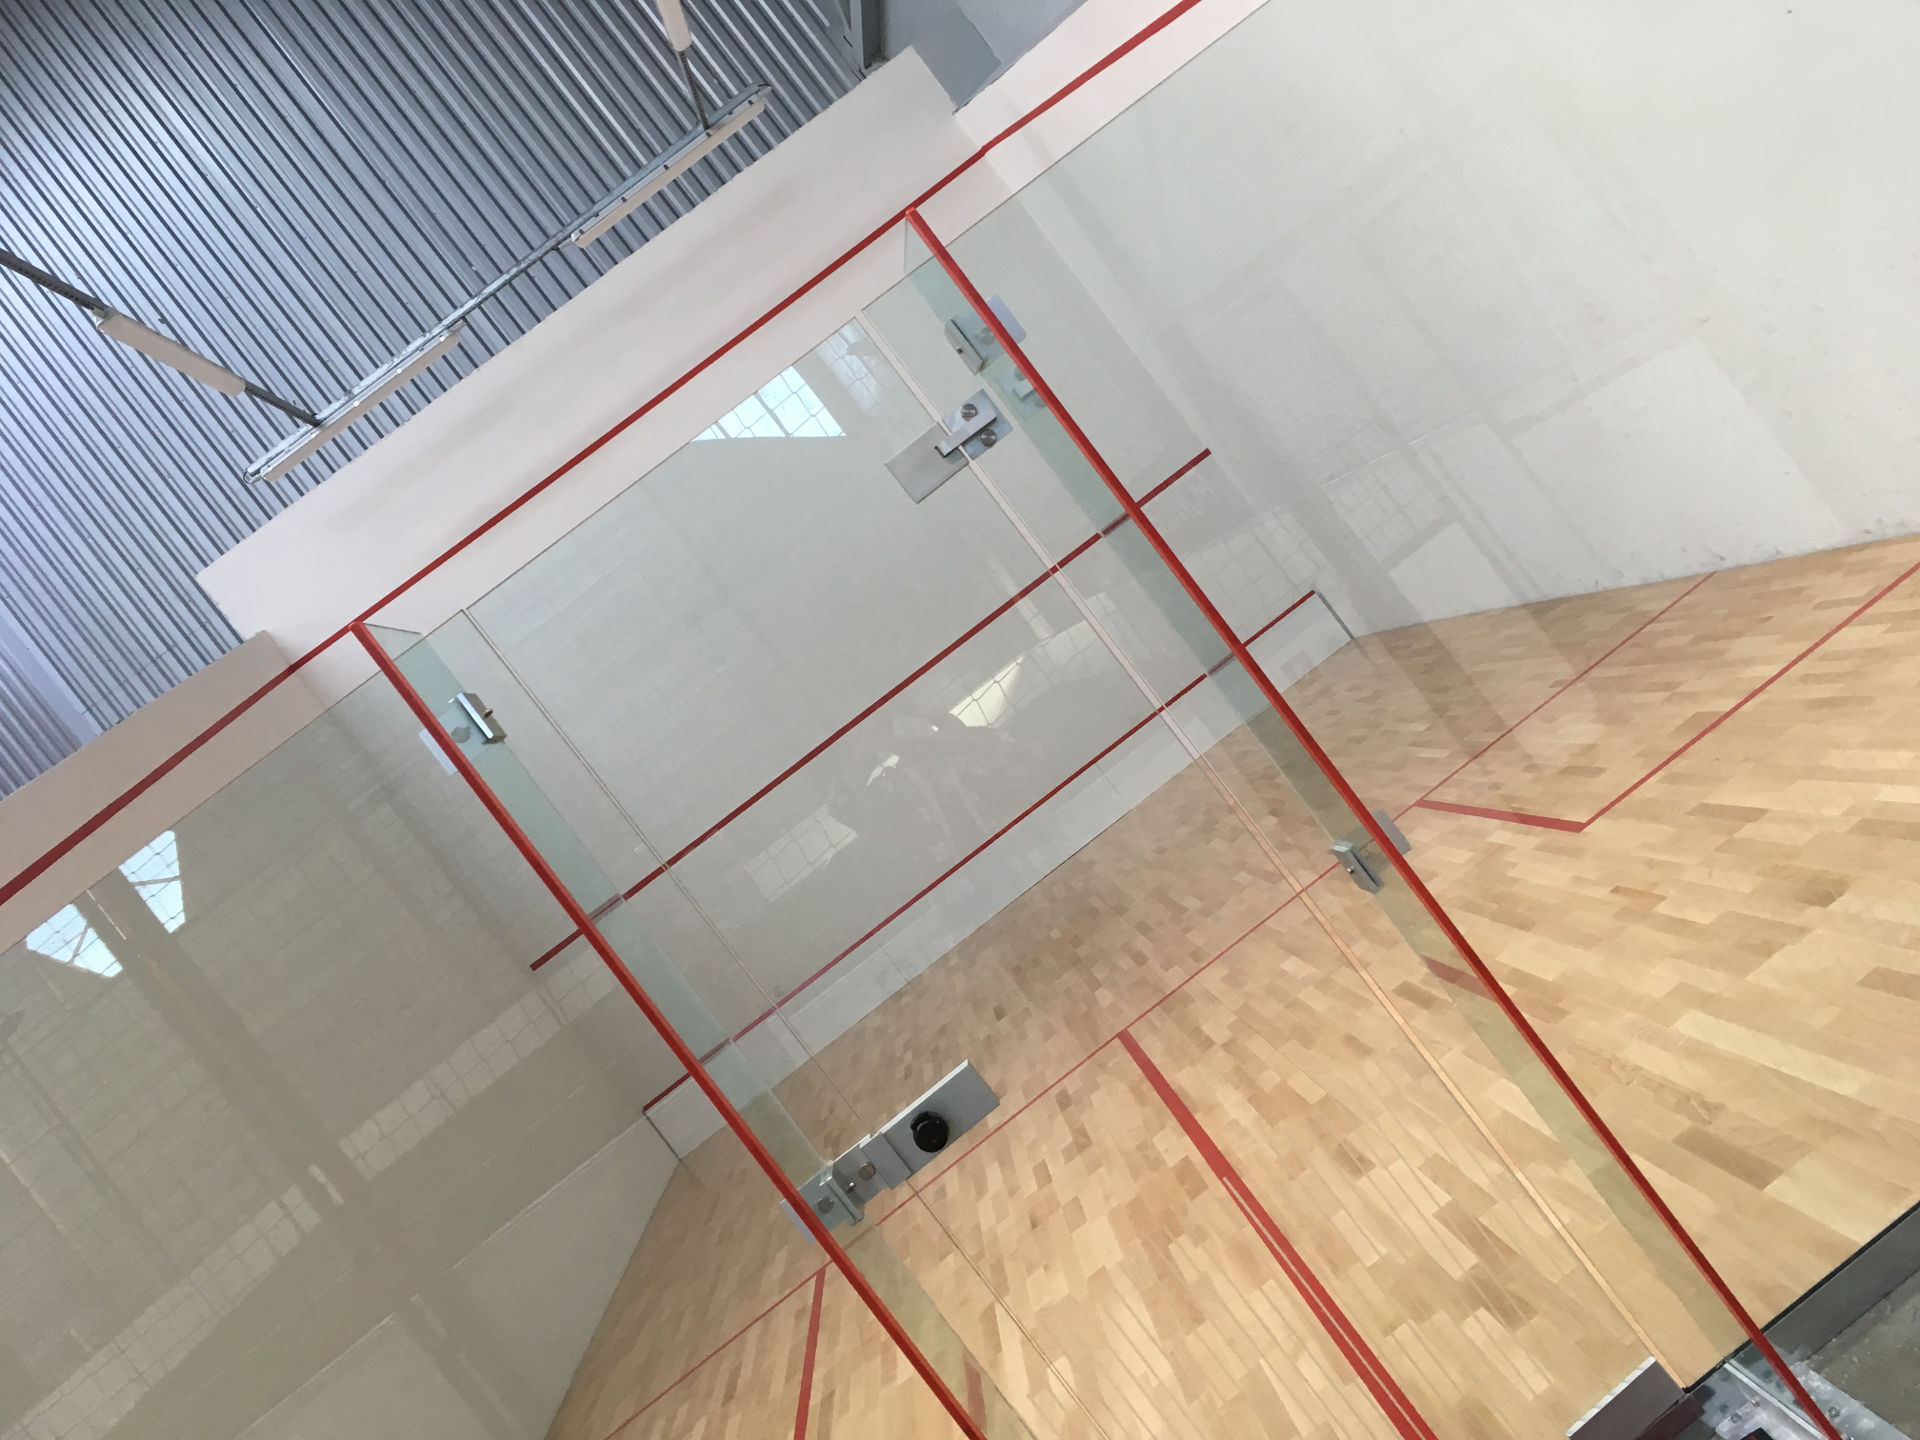 fabricant terrain de squash